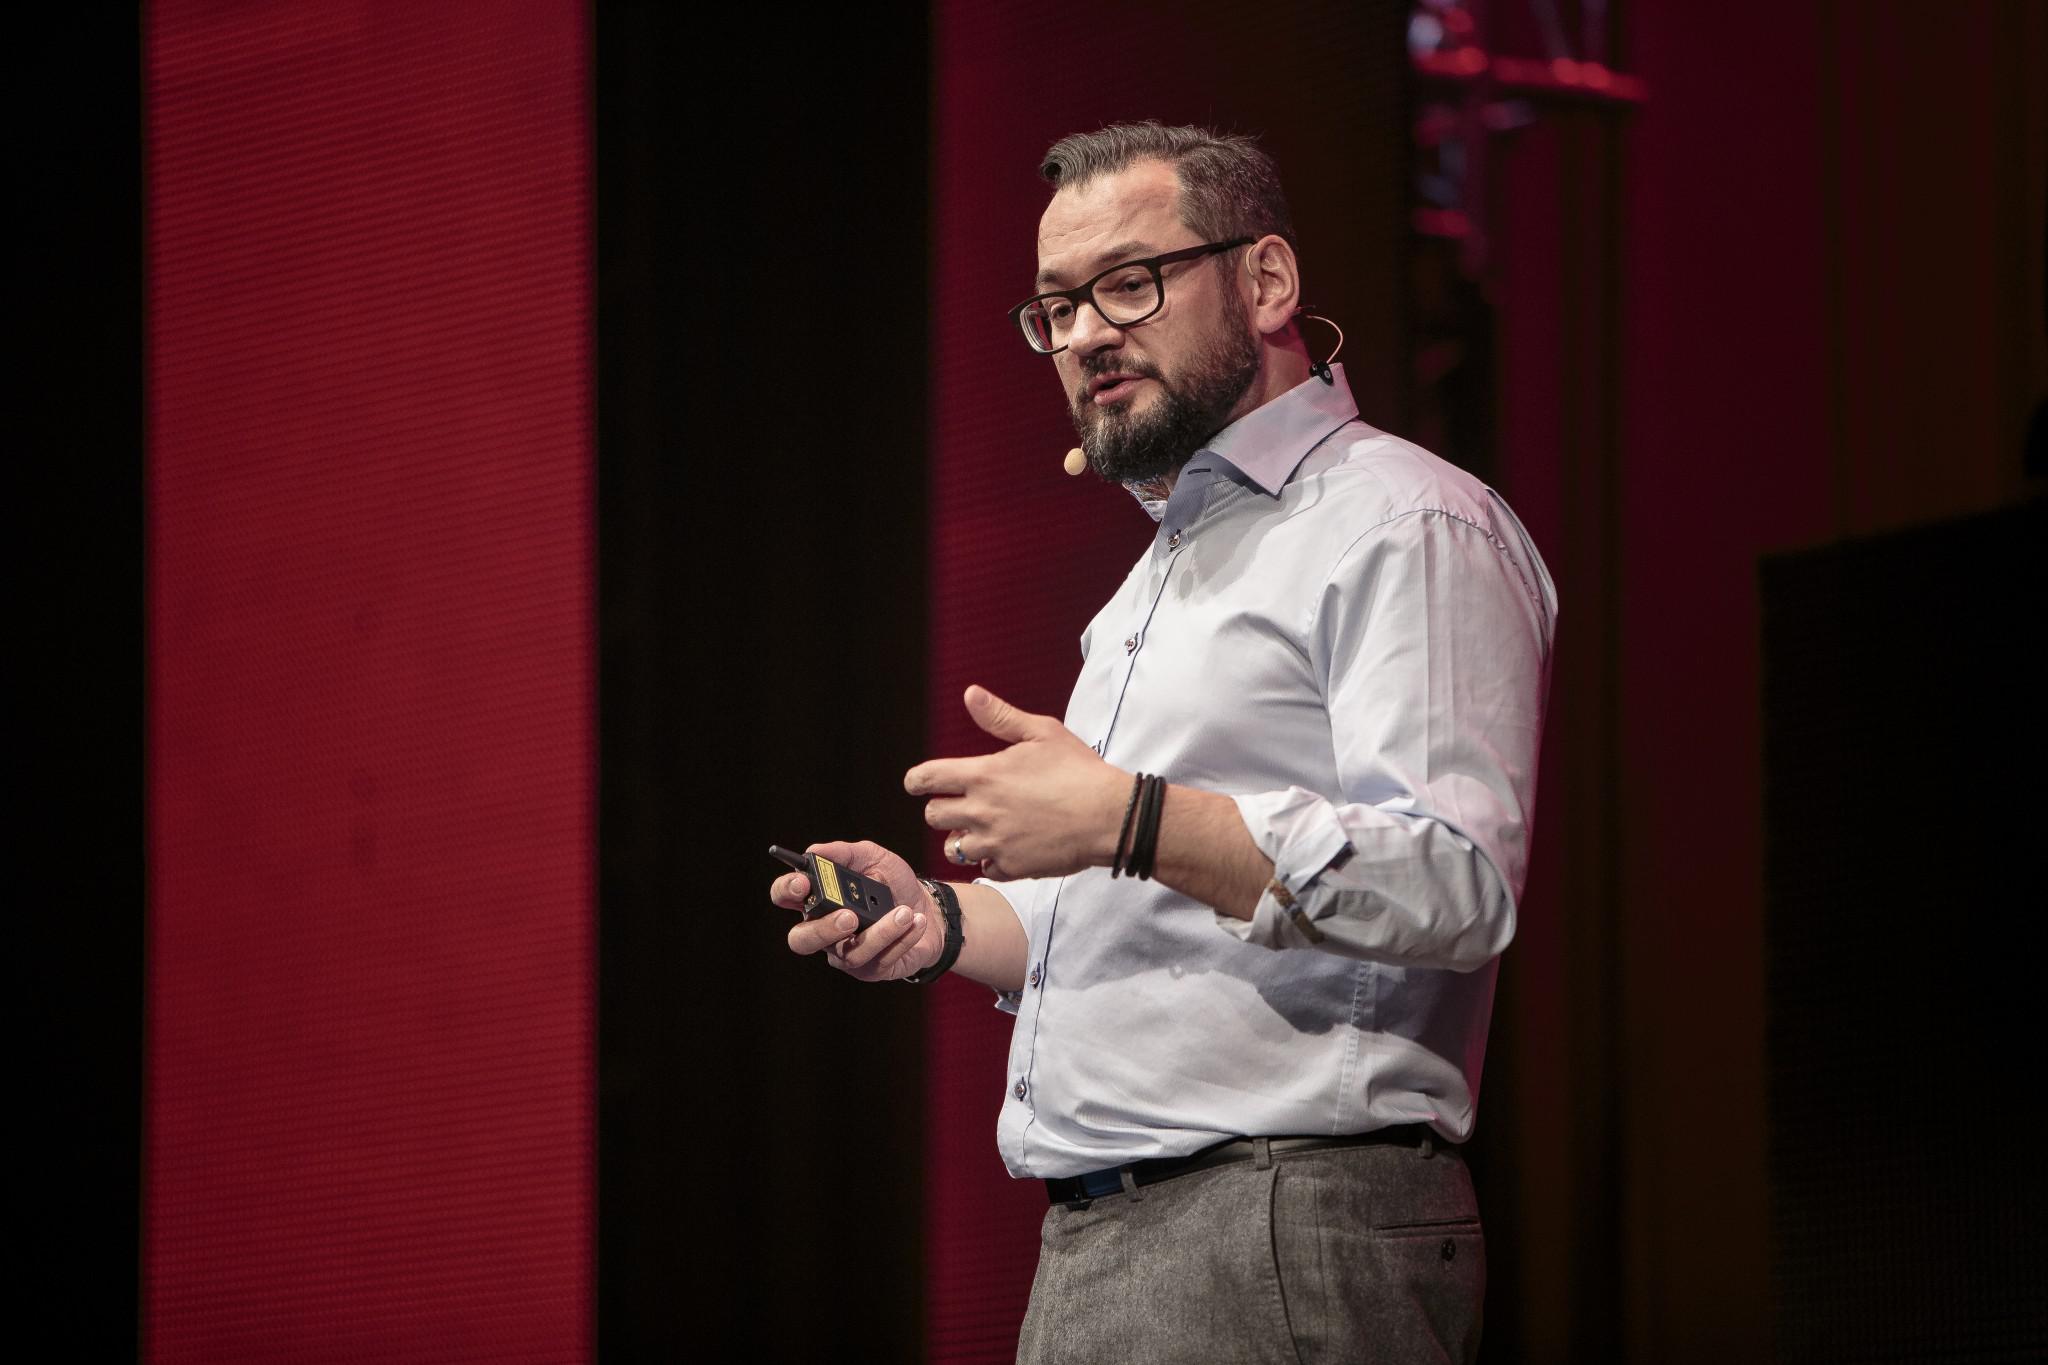 Dr. Marc Sniukas